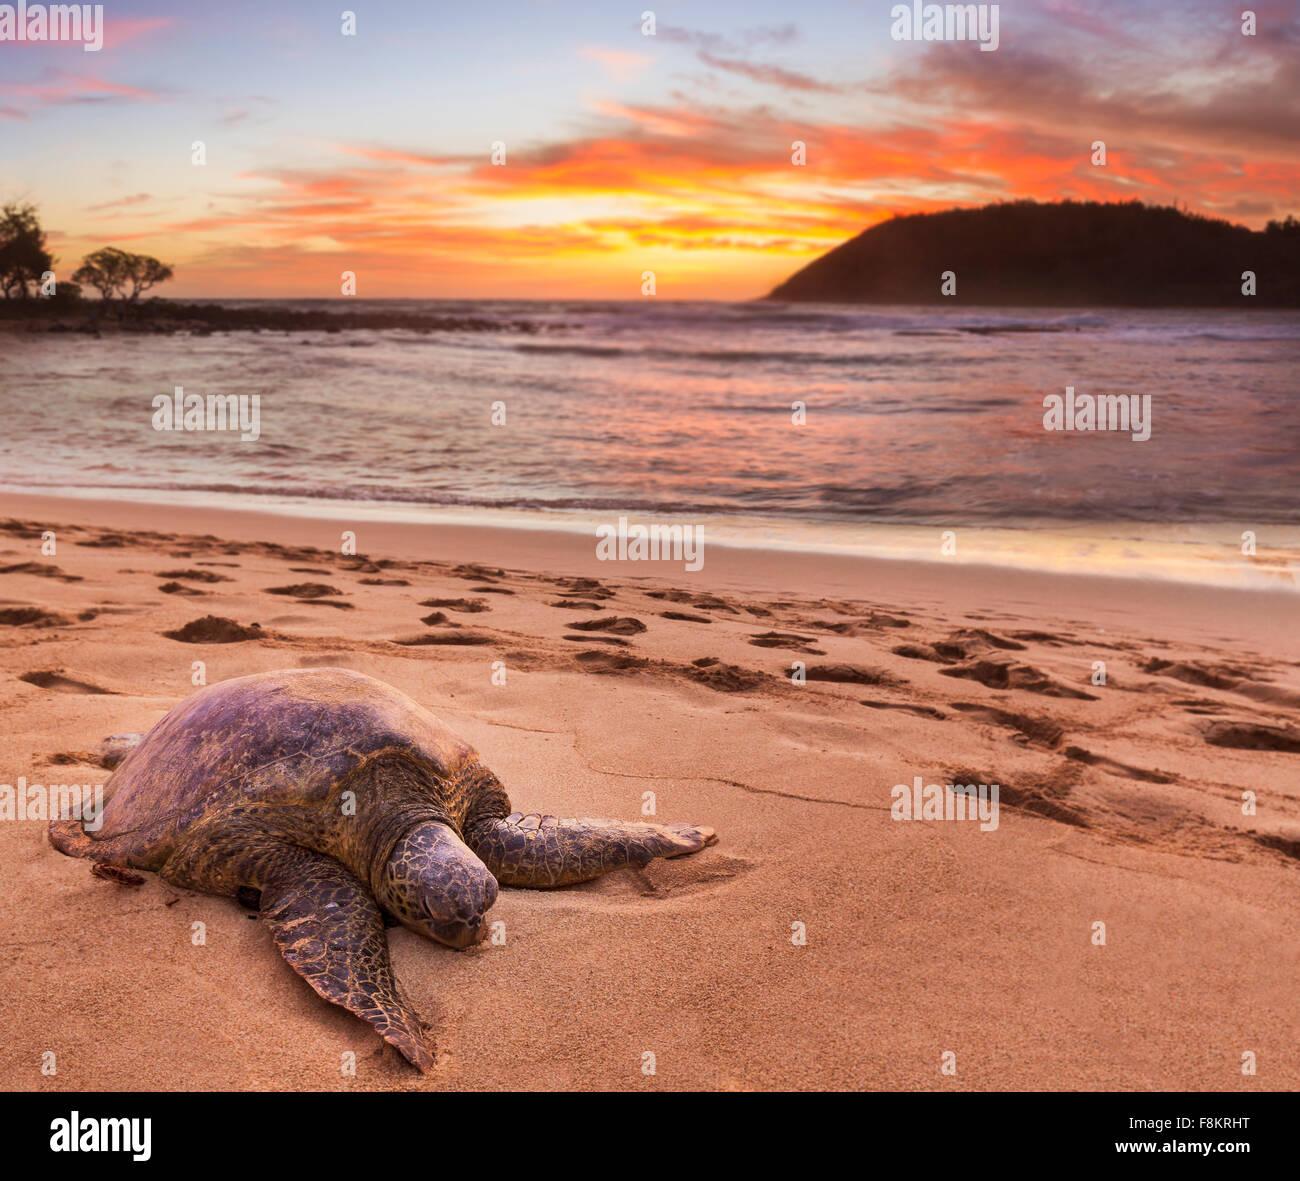 Green sea turtle - Chelonia mydas - on the sand at Moloa'a Beach on east coast of Kauai in Hawaii Stock Photo